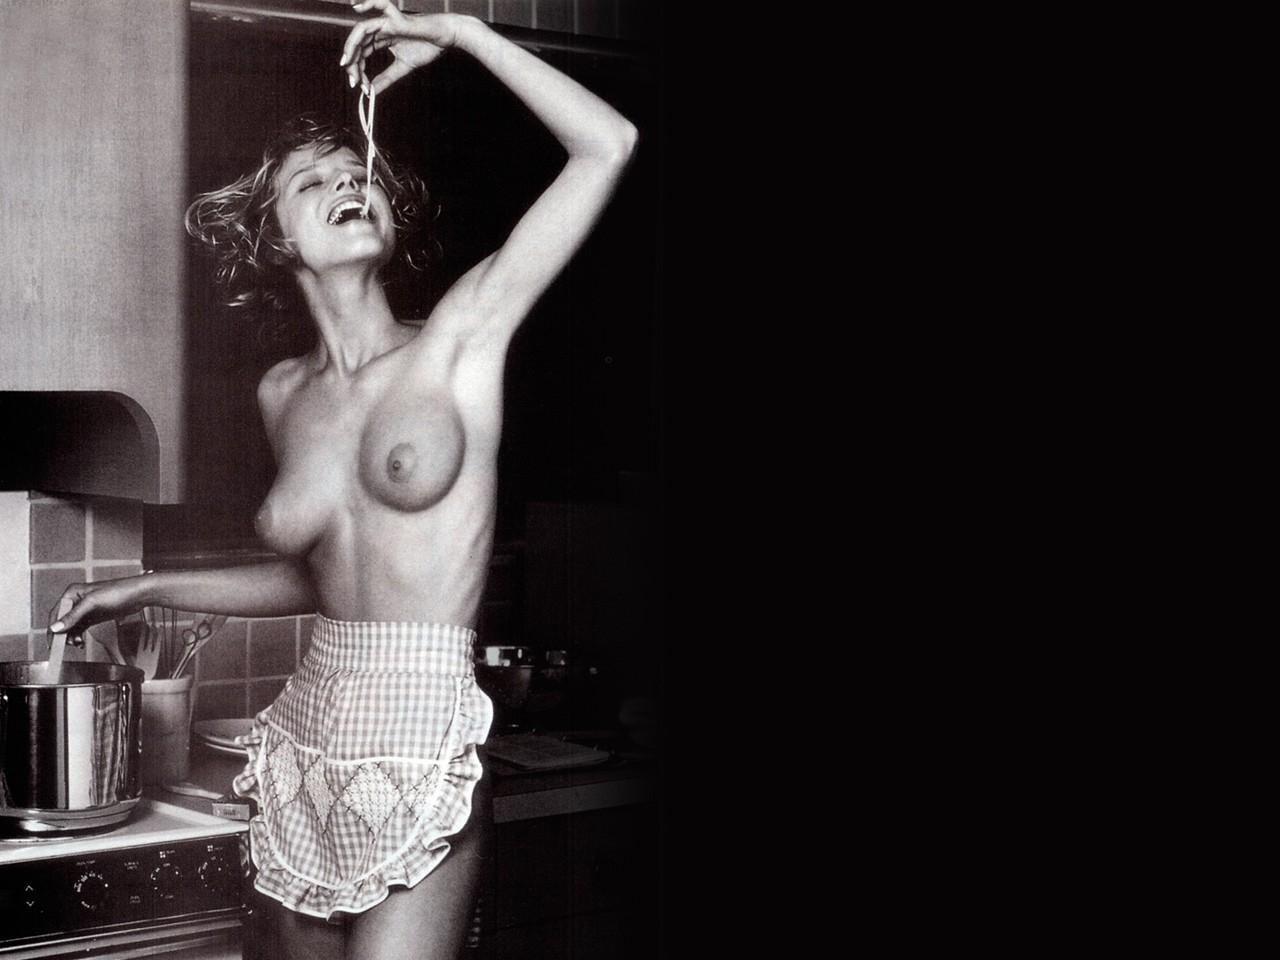 Wallpaper di Eva Herzigova in topless